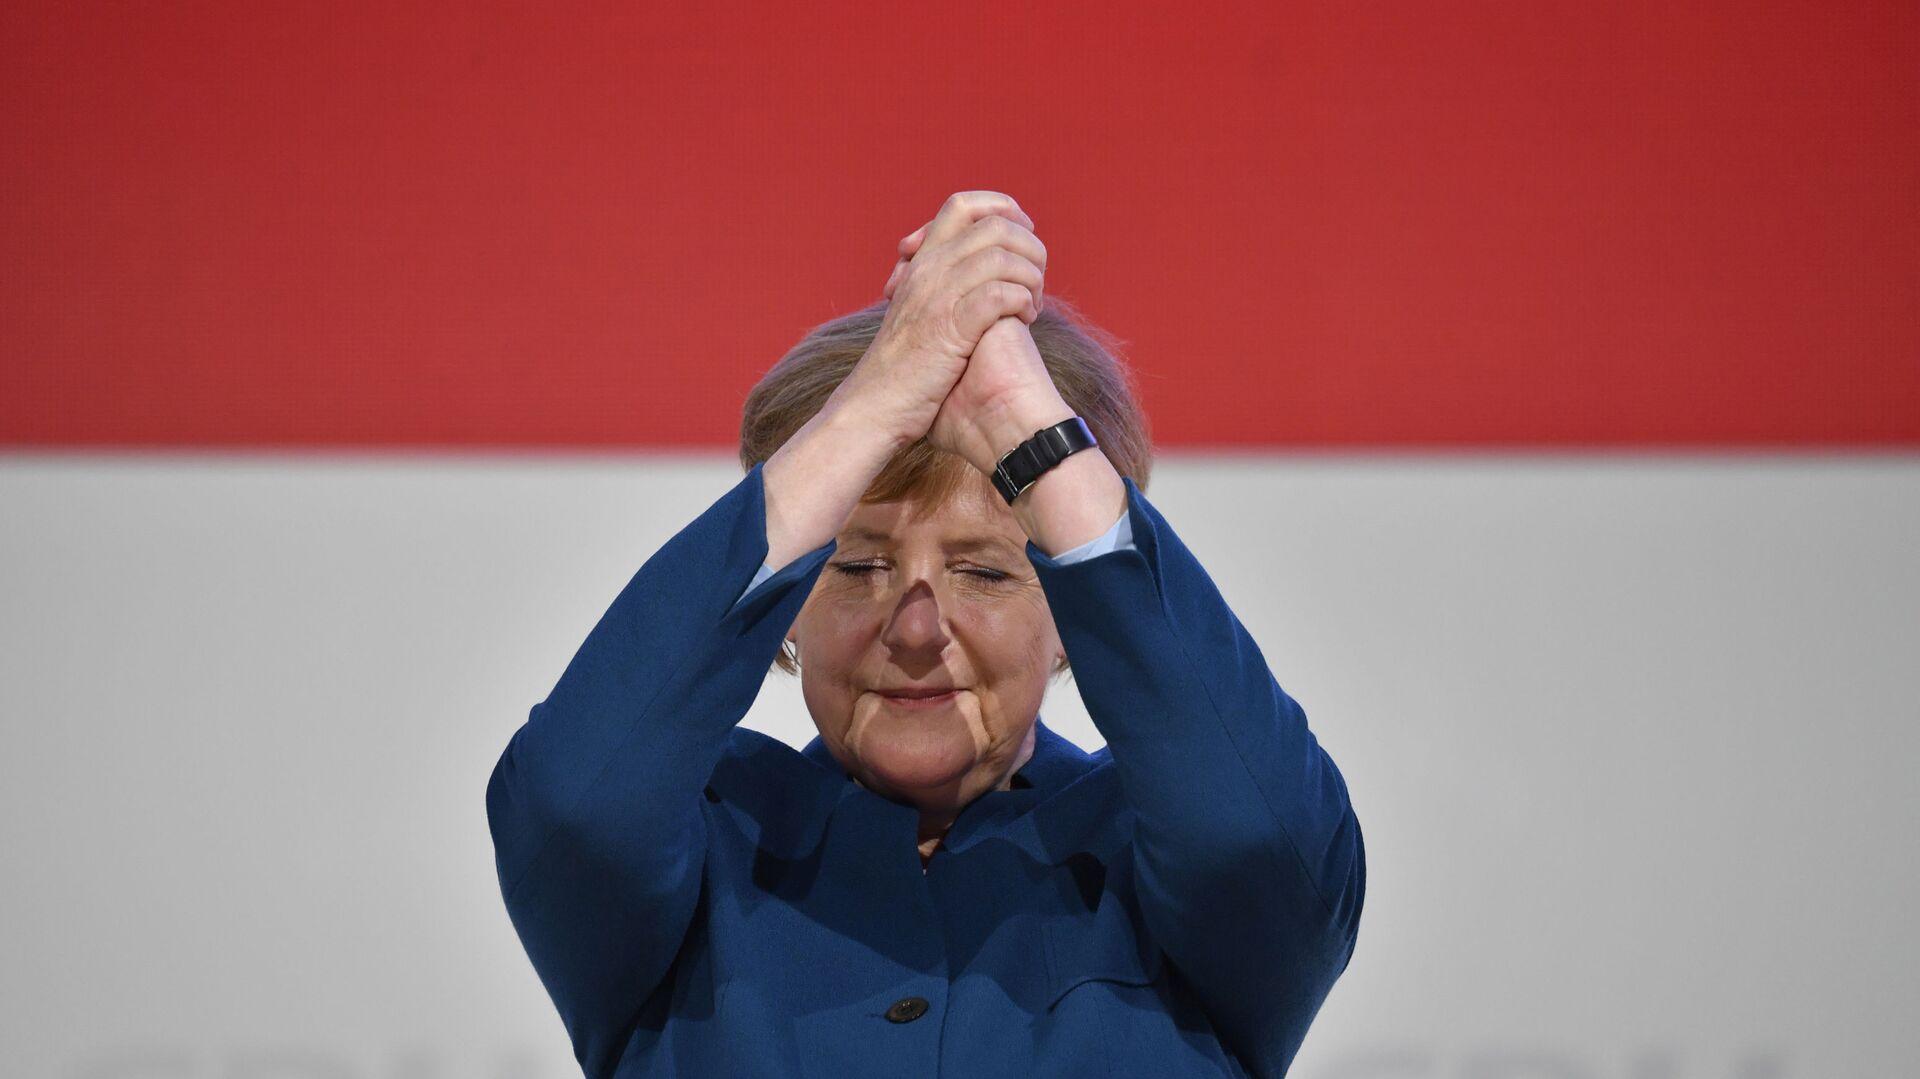 Канцлер Германии Ангела Меркель  - Sputnik Таджикистан, 1920, 20.04.2021